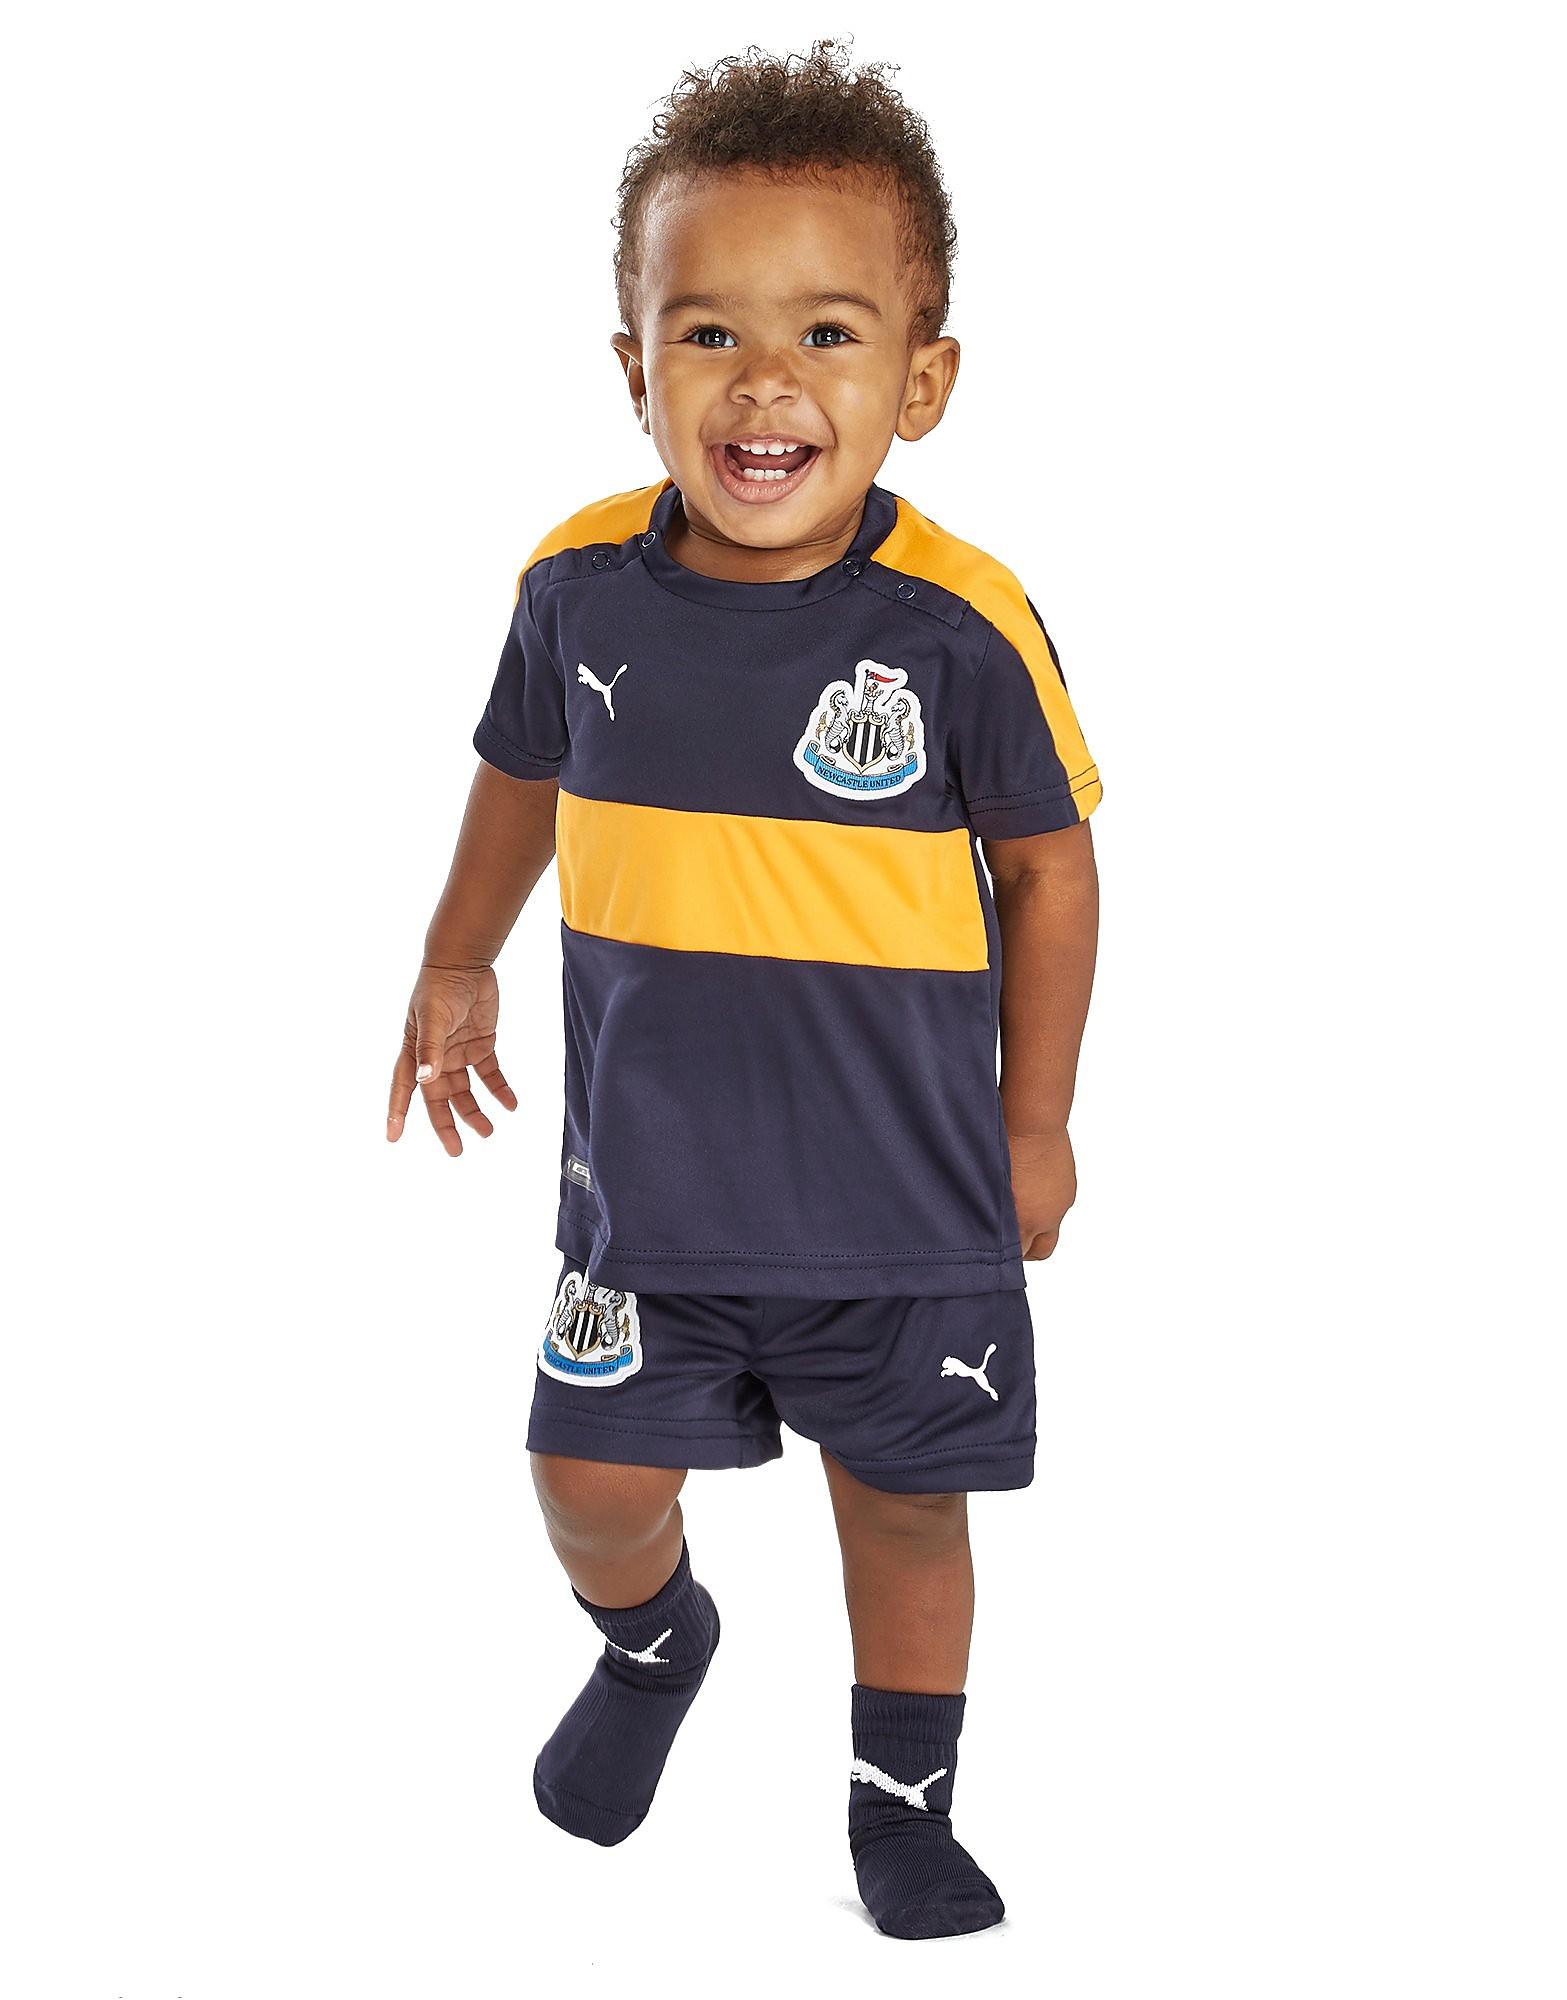 PUMA Newcastle United 2016/17 Auswärts-Kit für Babys